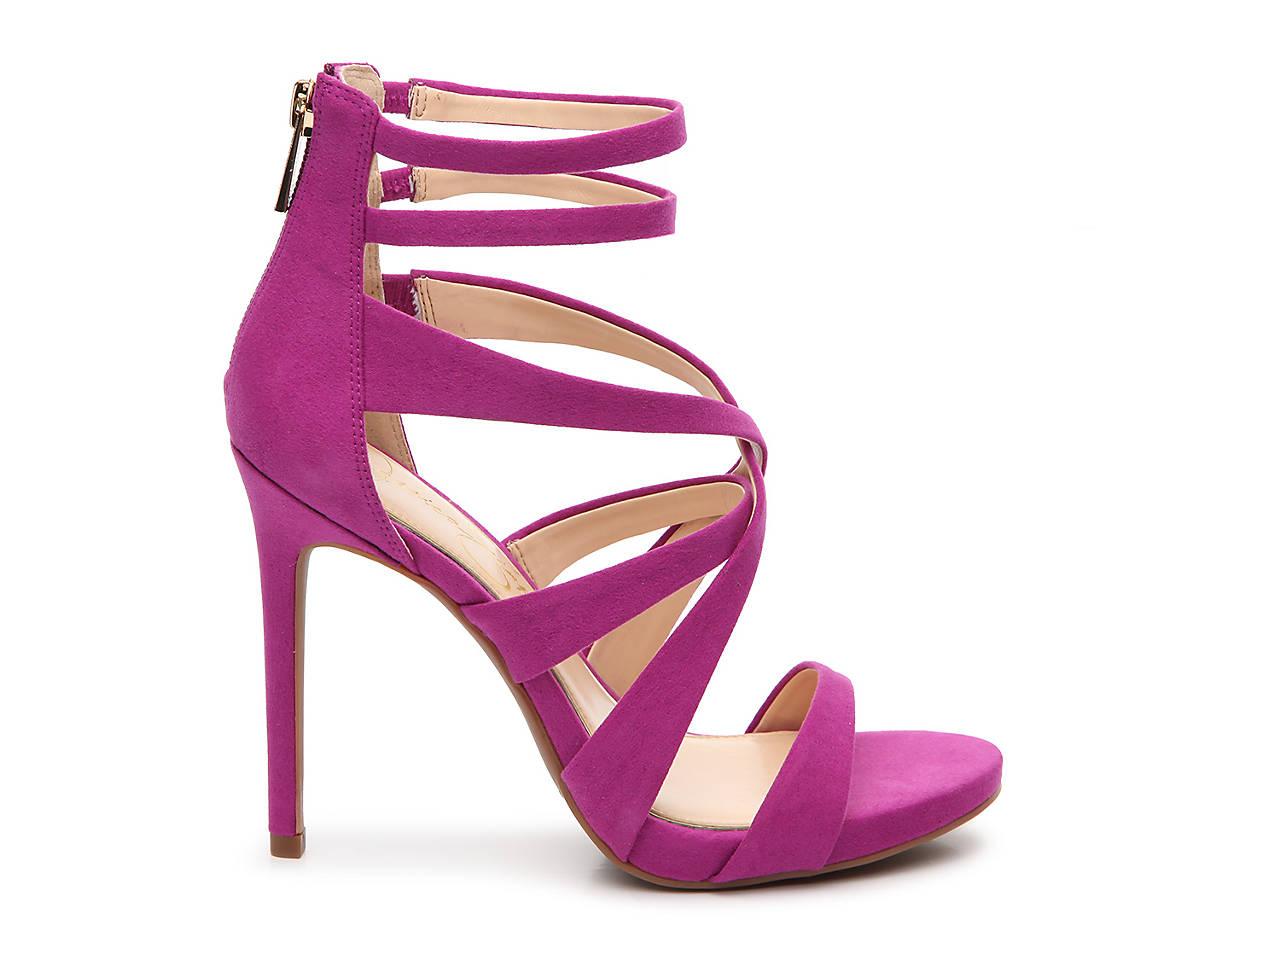 992eb6e2275 Jessica Simpson Rayomi Platform Sandal Women s Shoes